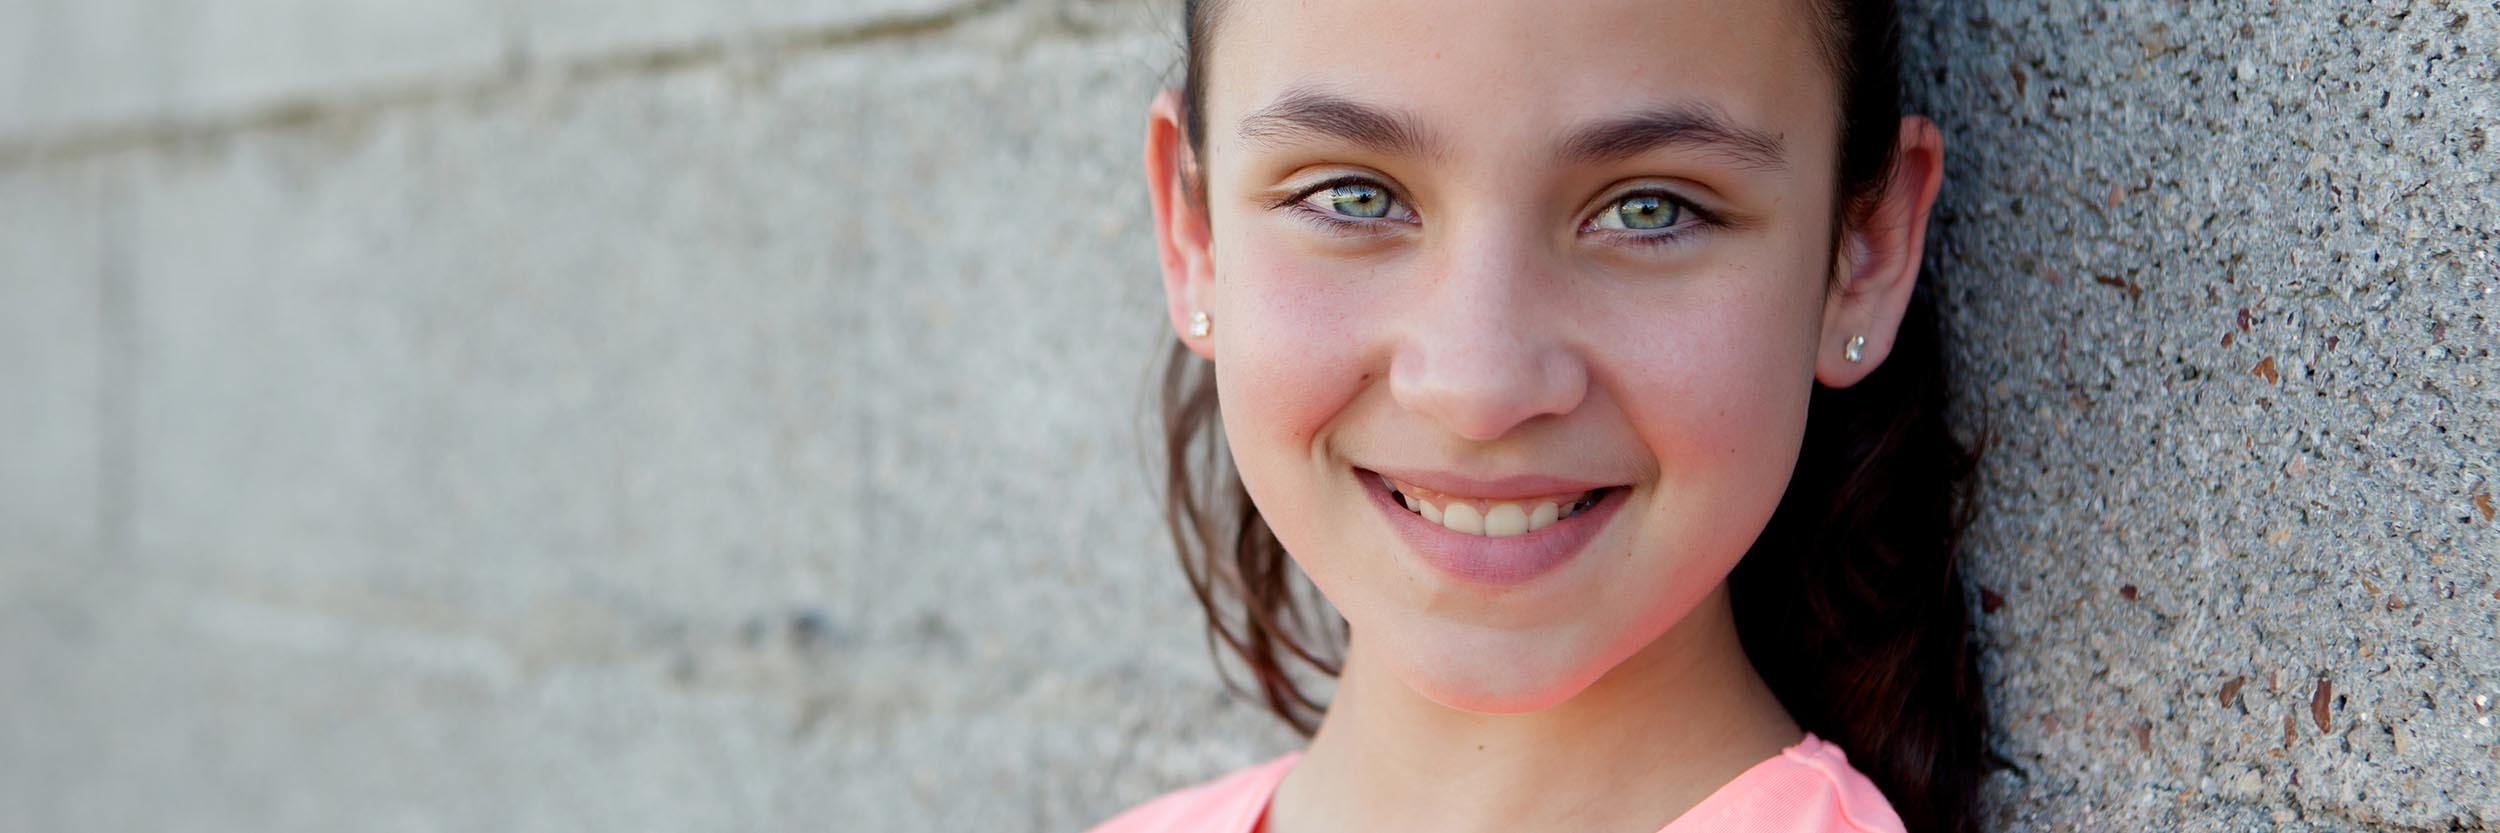 Girl with white smile